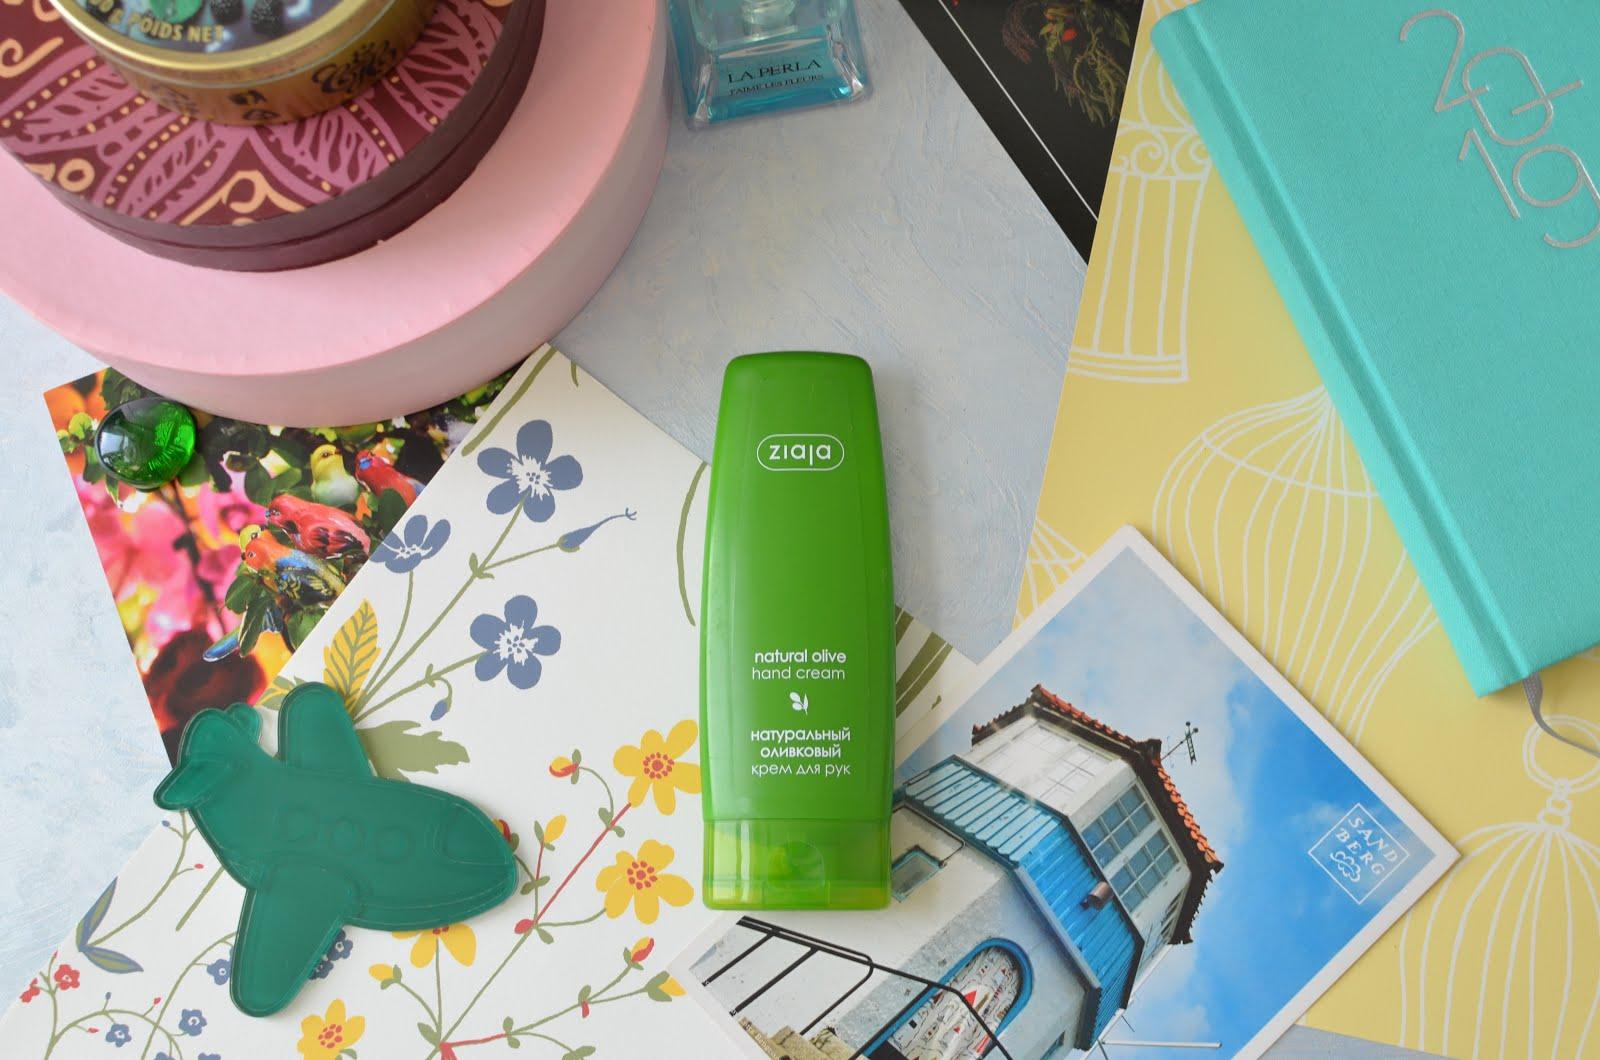 Ziaja Natural Olive Cream For Hand and Nail\ Натуральный оливковый крем для рук и ногтей